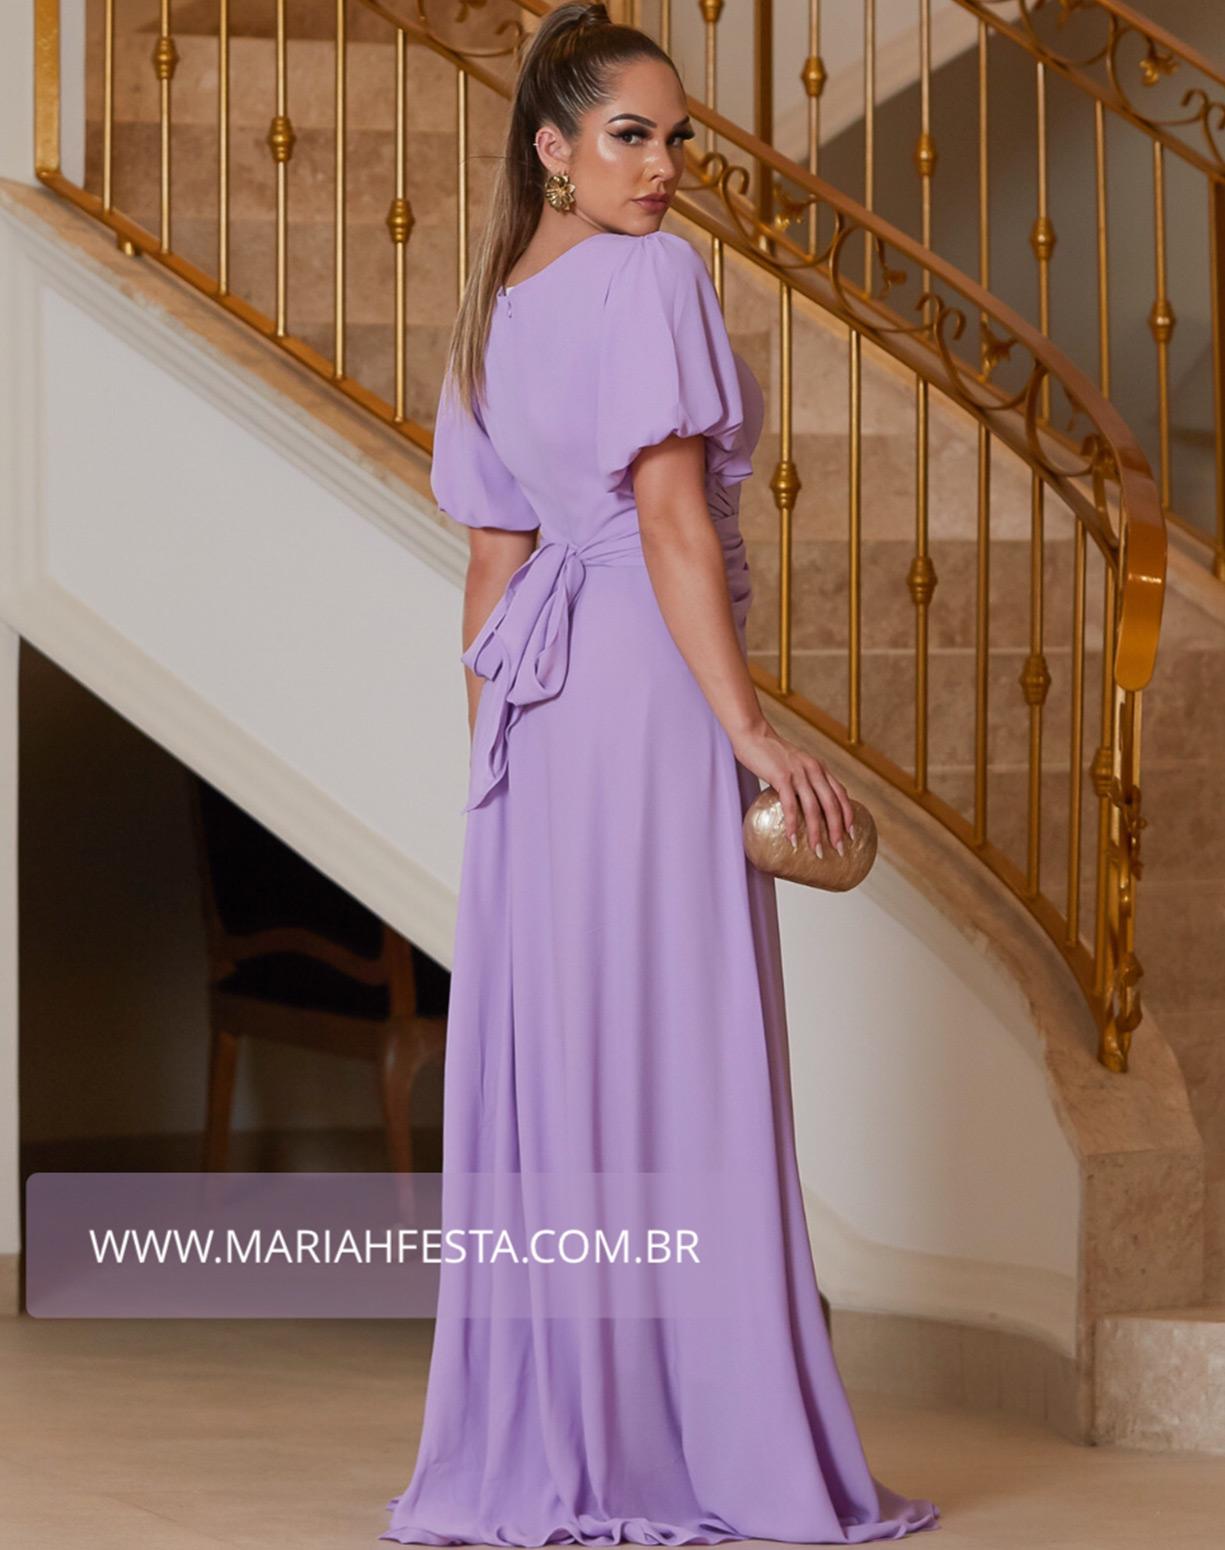 Vestido Lavanda com Manga Bufante e Cinto Drapeado